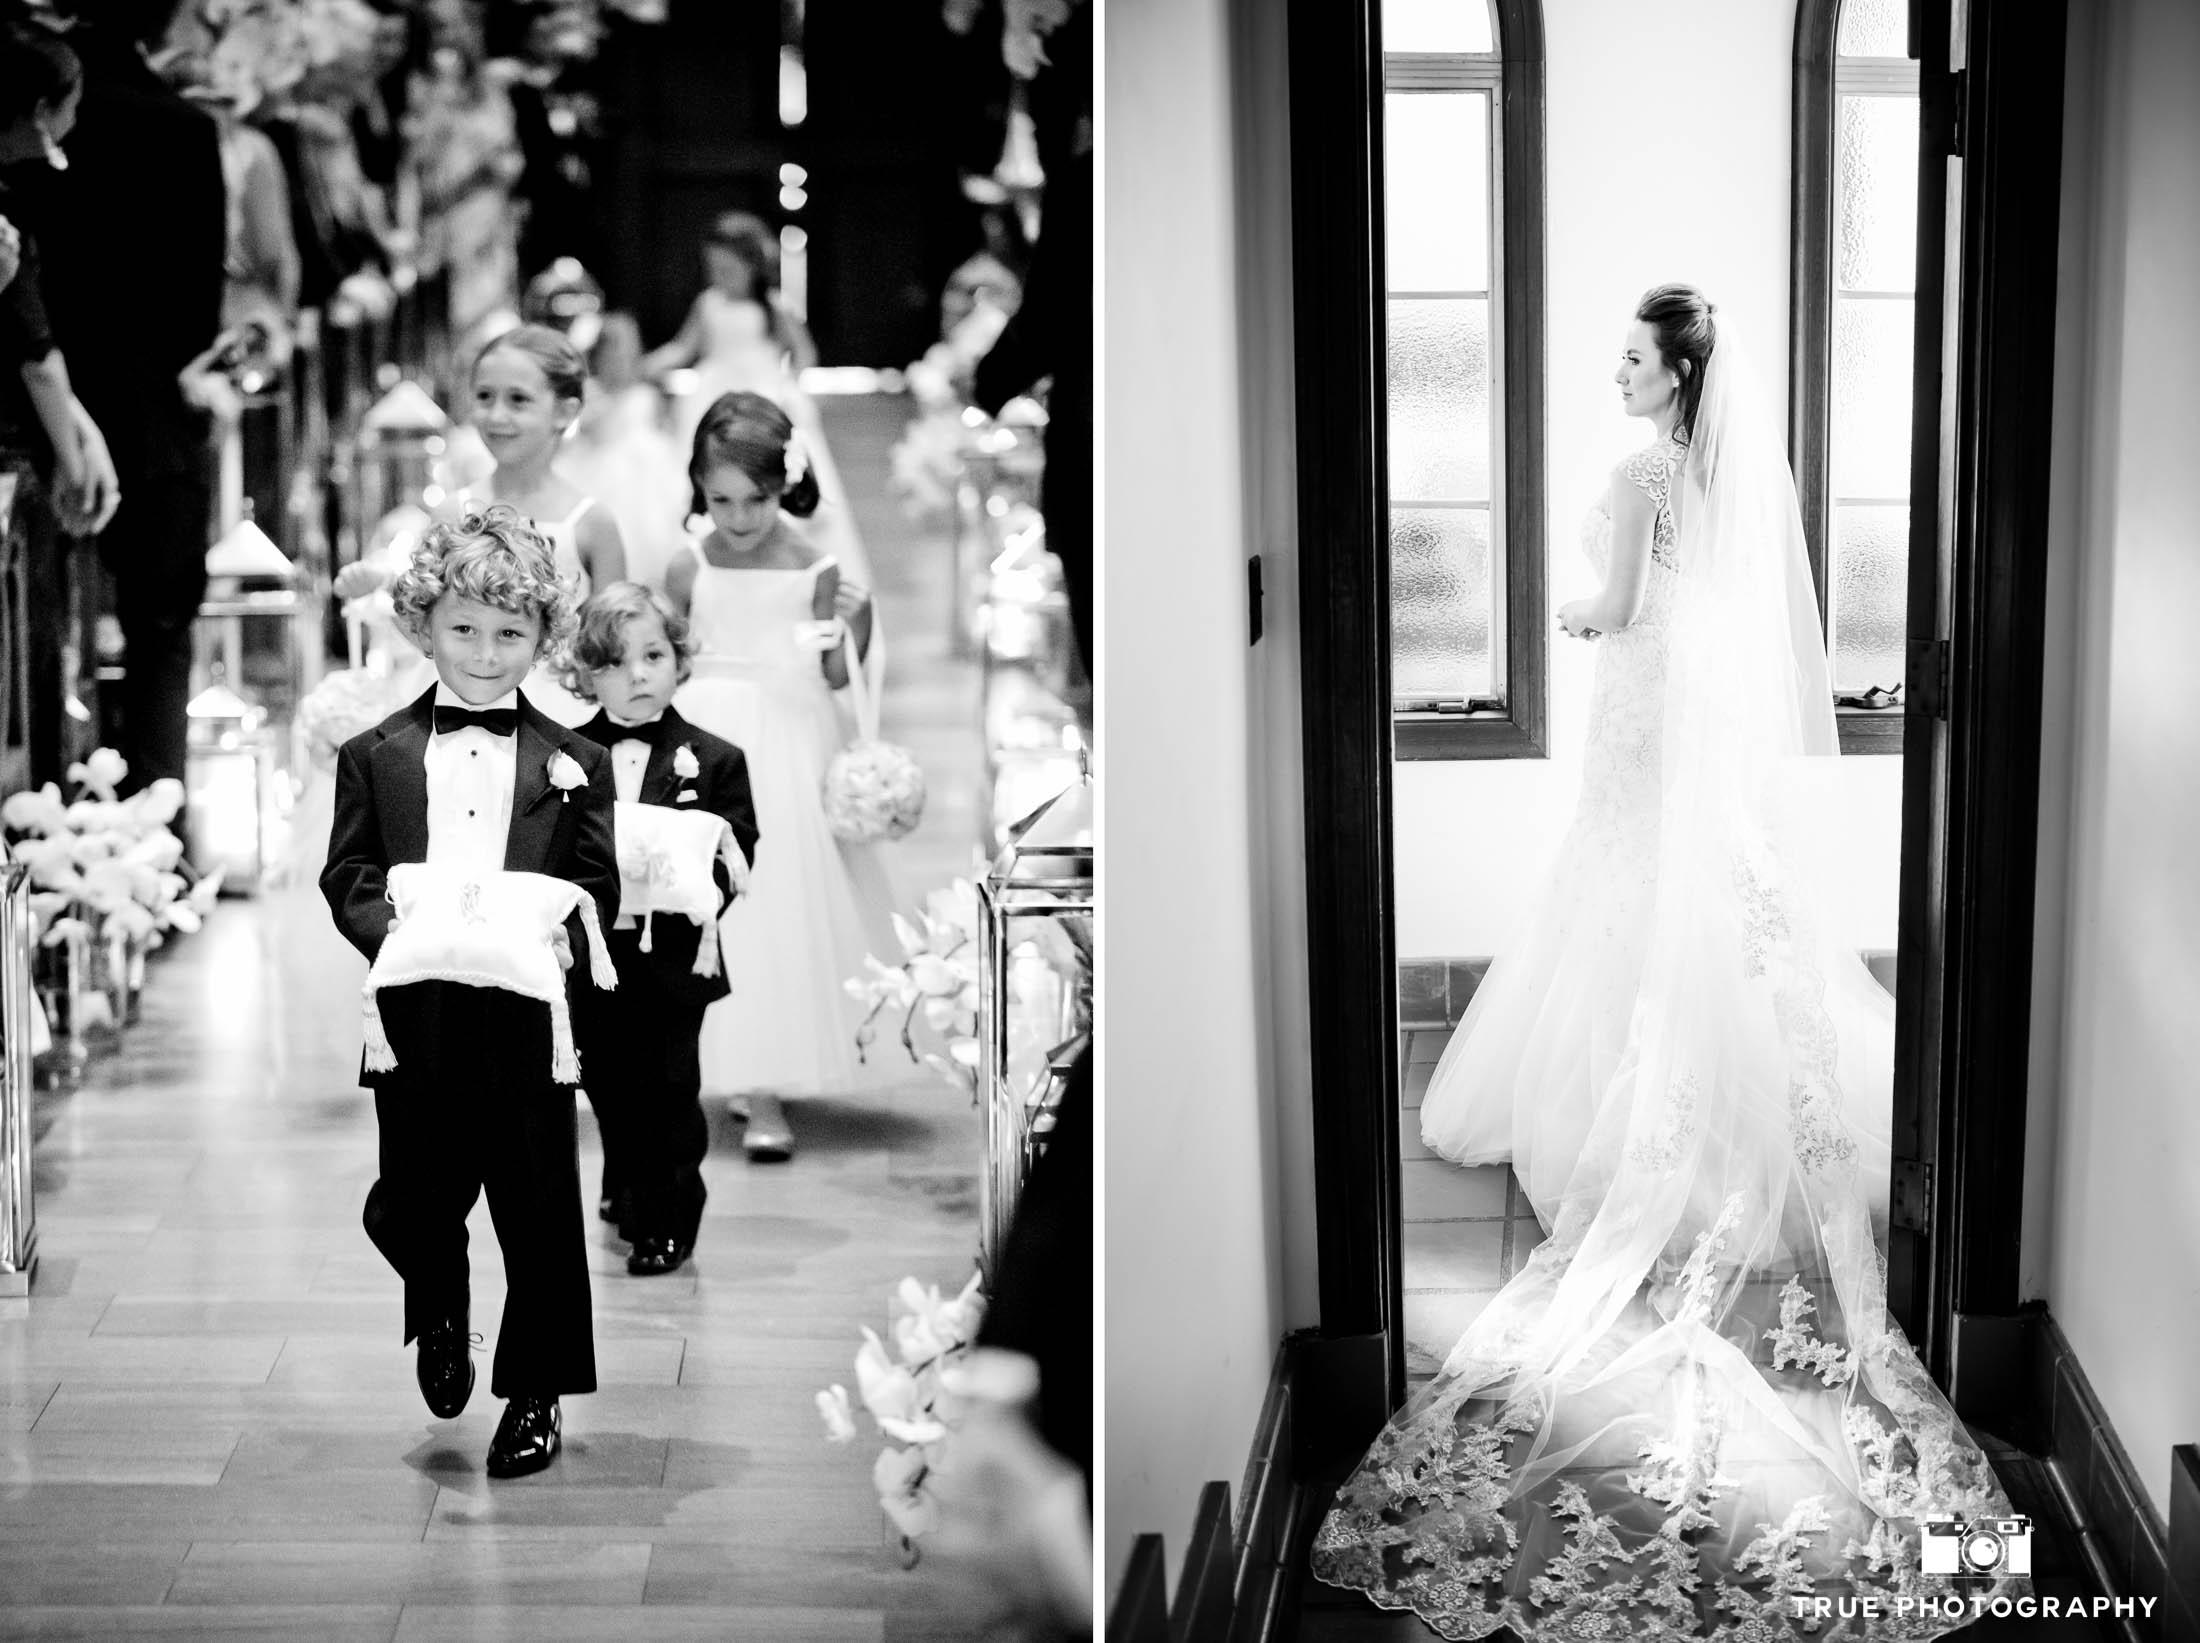 Couples takes advantage having two photographers at their wedding